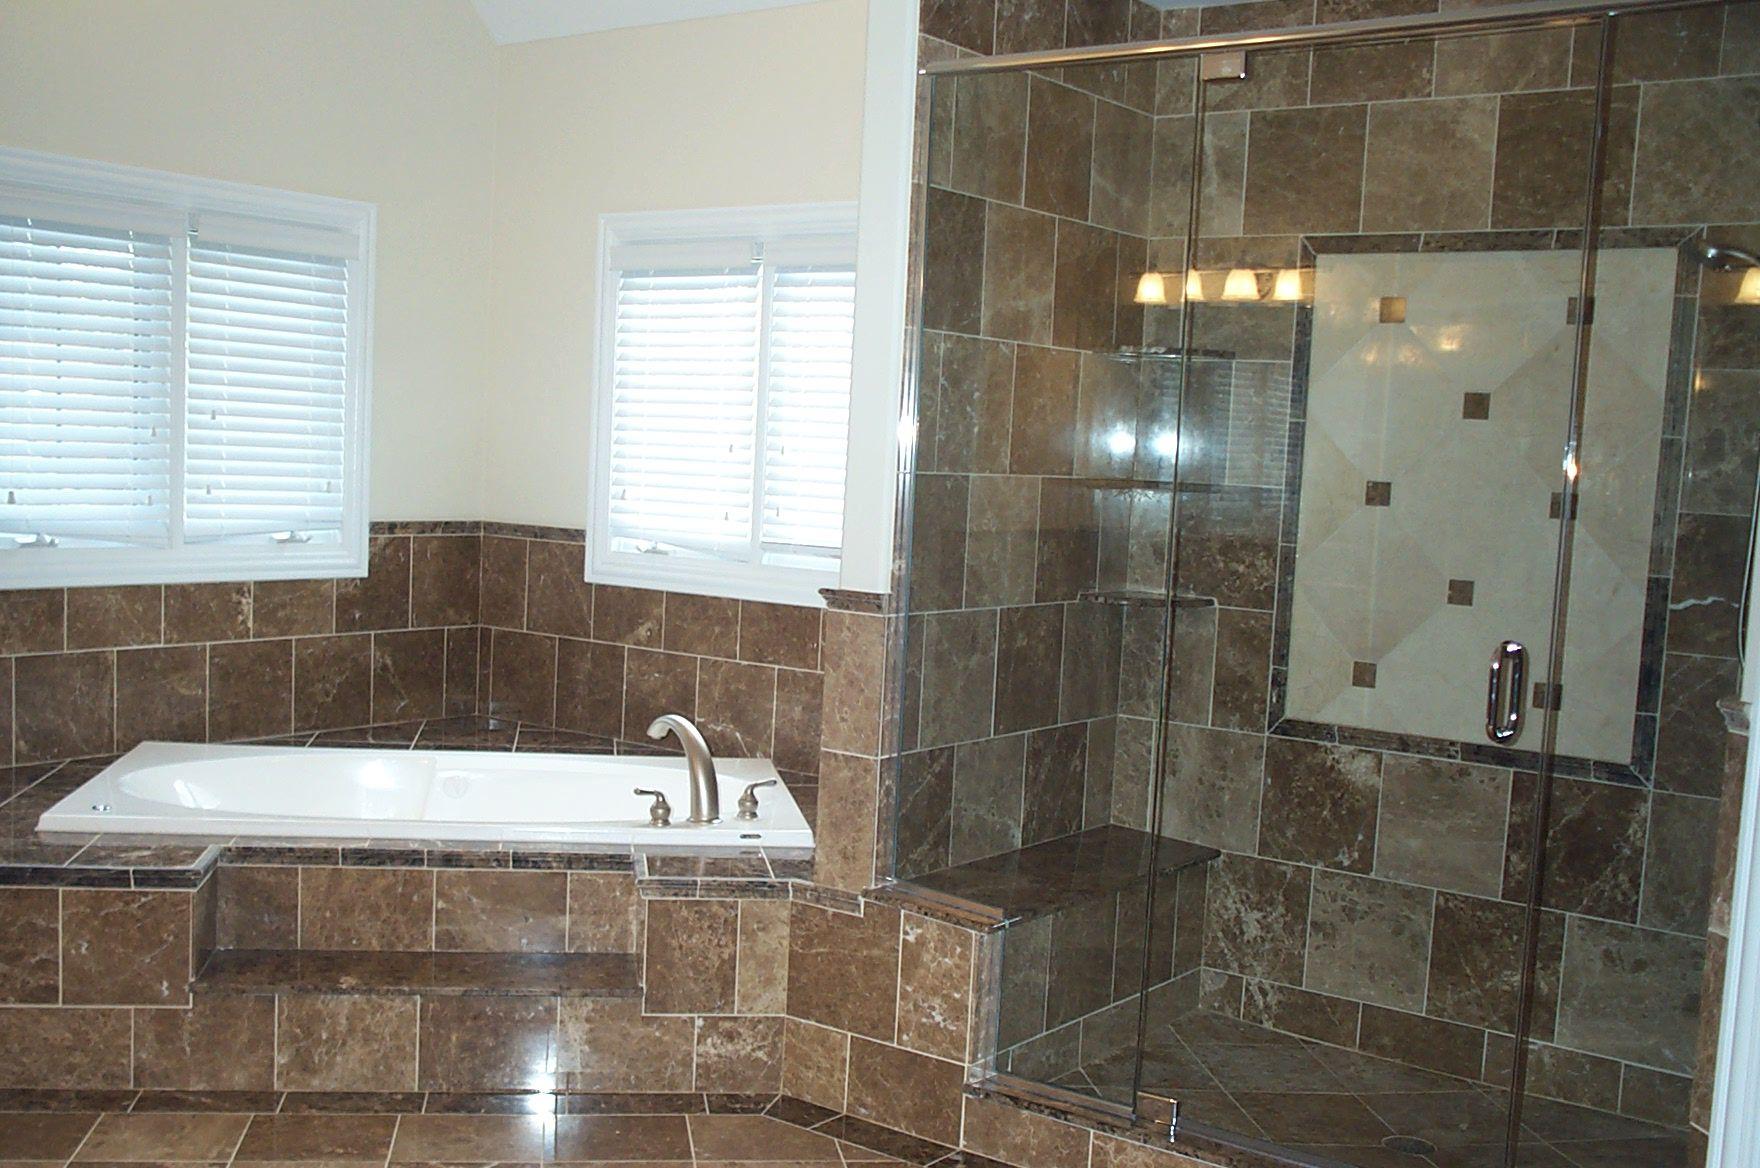 Bathroom Remodel Pictures Emaxhomes Net Emaxhomes Net Bathrooms Remodel Bathroom Remodel Tile Inexpensive Bathroom Remodel